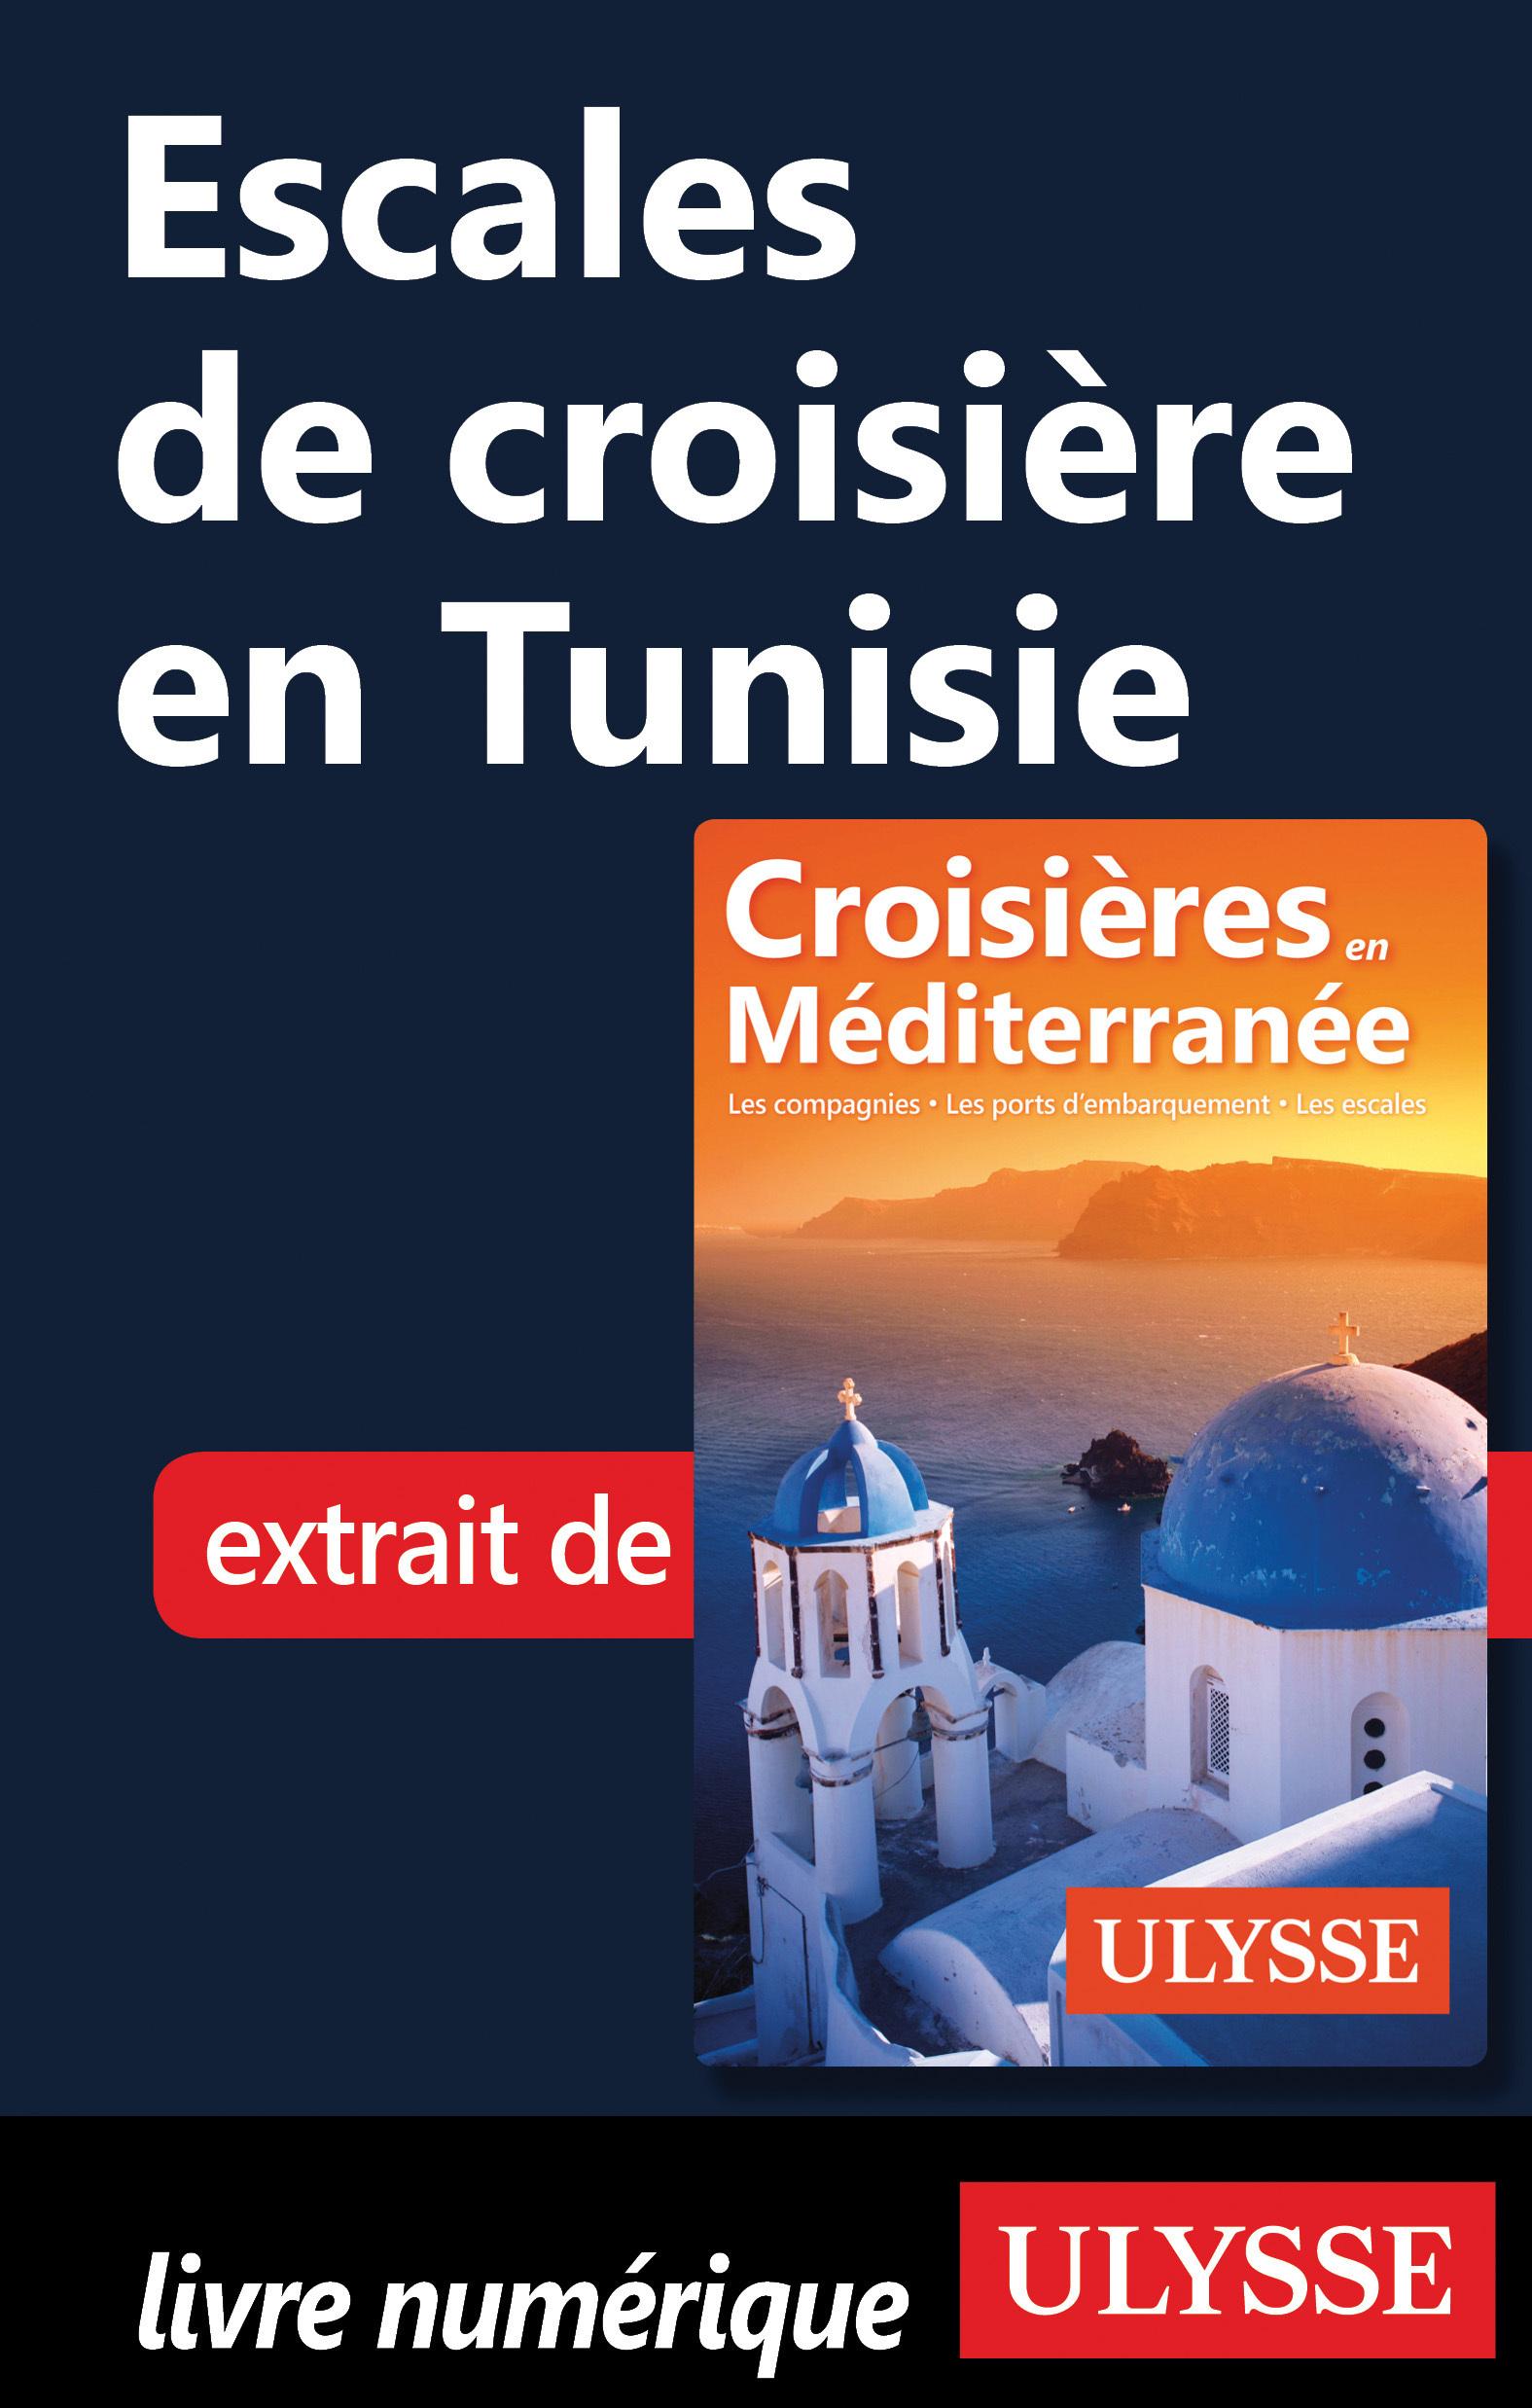 Escales de croisière en Tun...